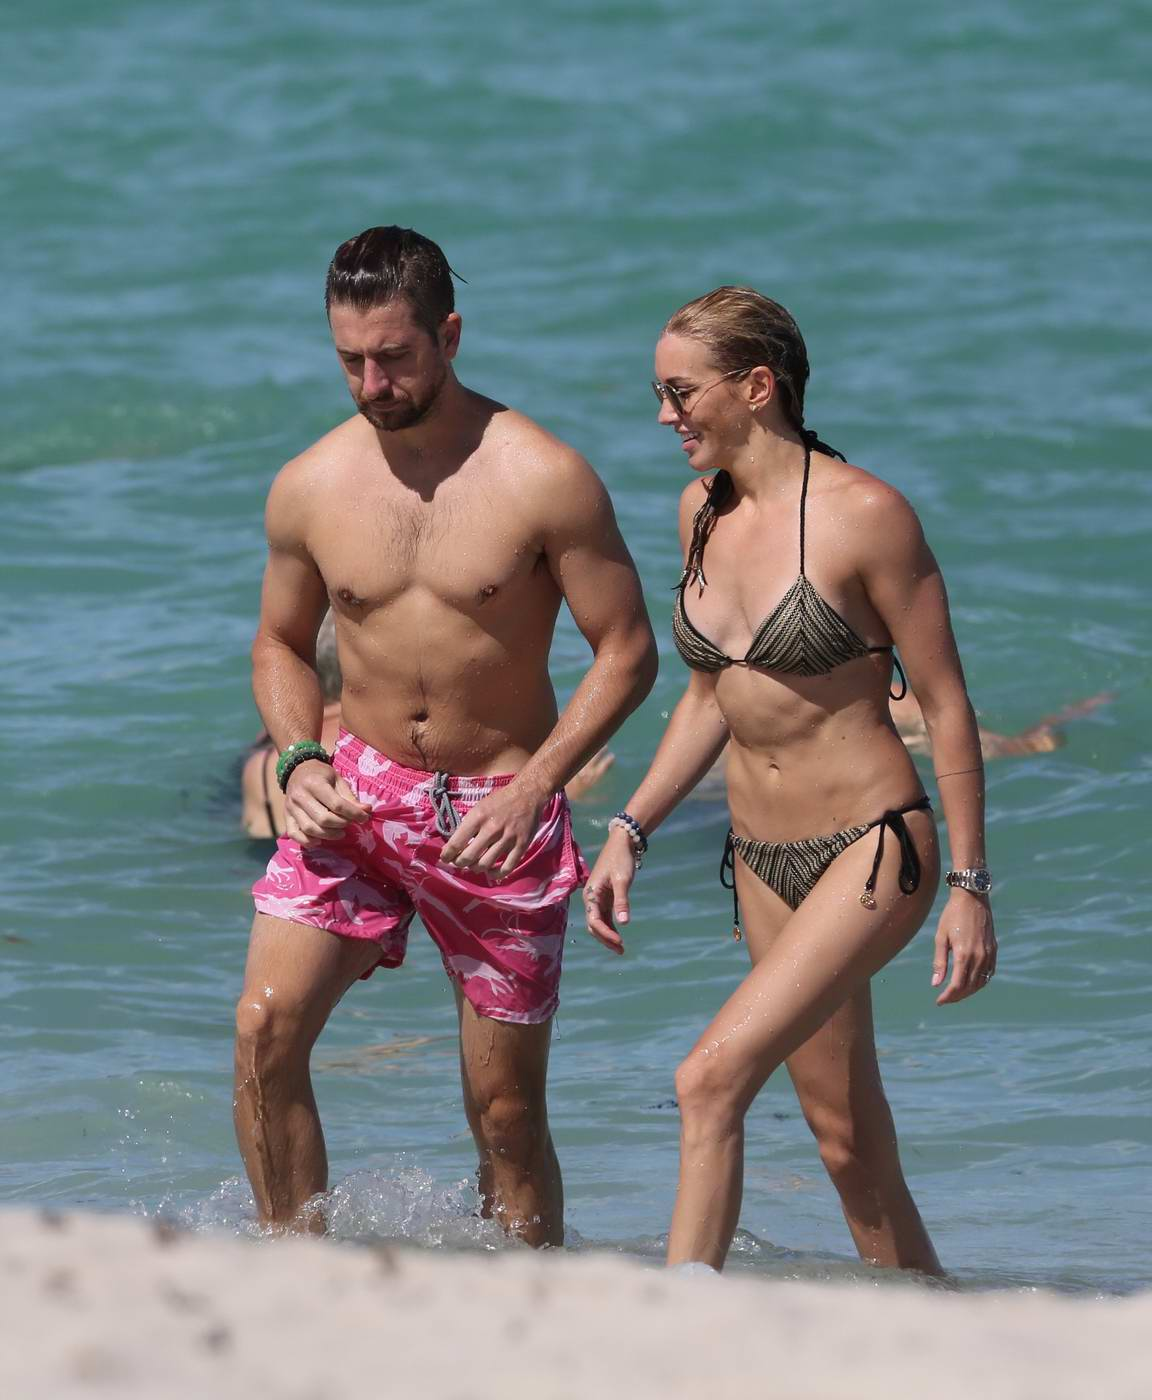 Katie Cassidy in Bikini enjoying a day off with her Boyfriend on the Beach in Miami